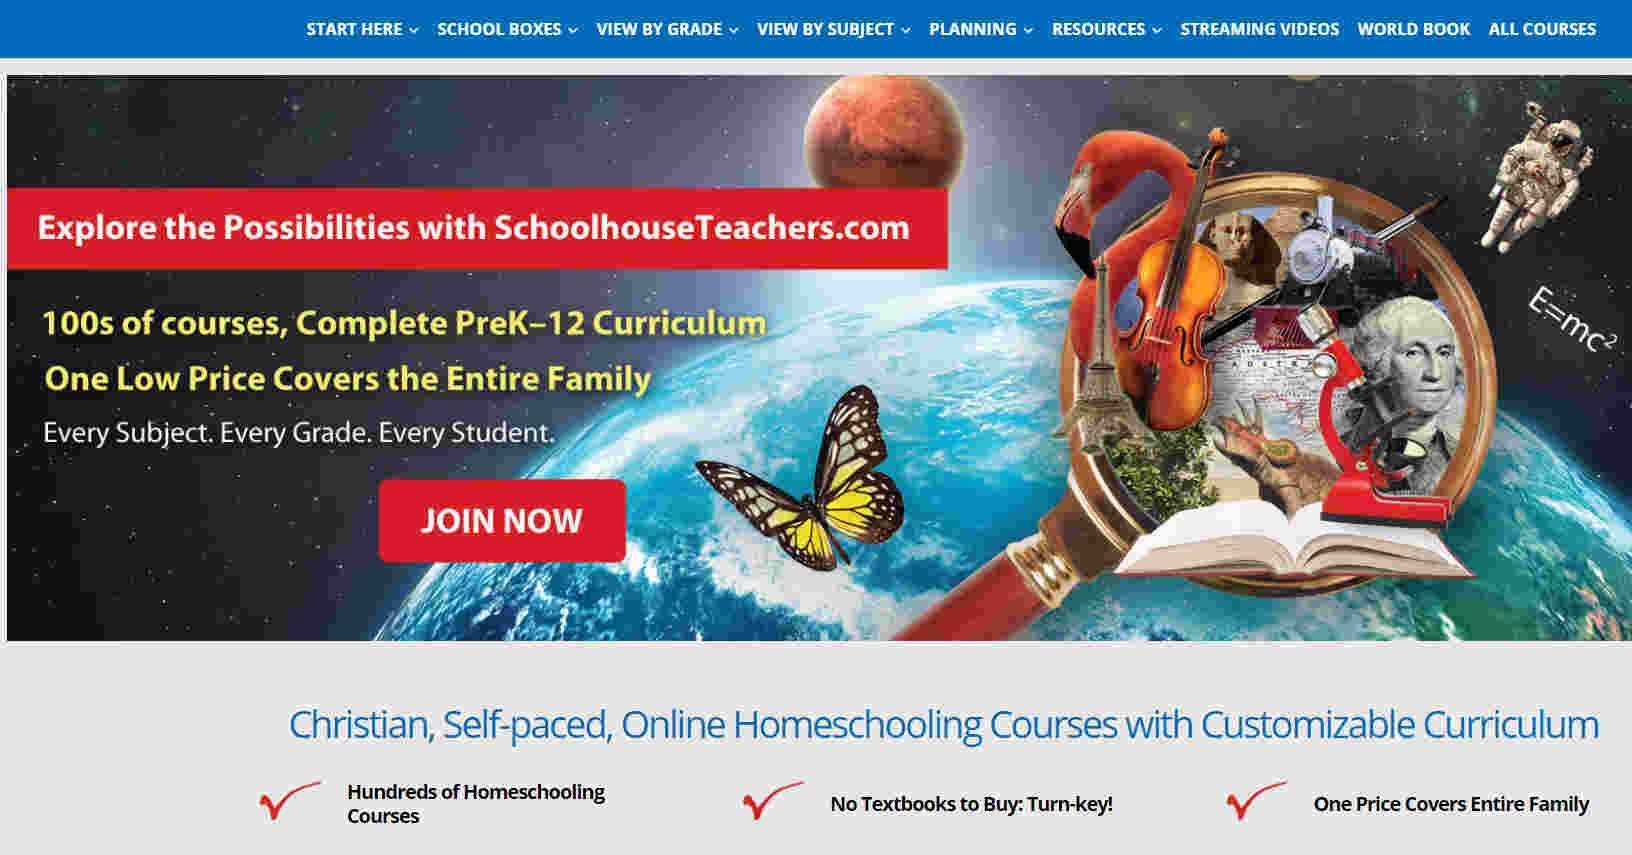 homepage pictures for schoolhouseteachers.com